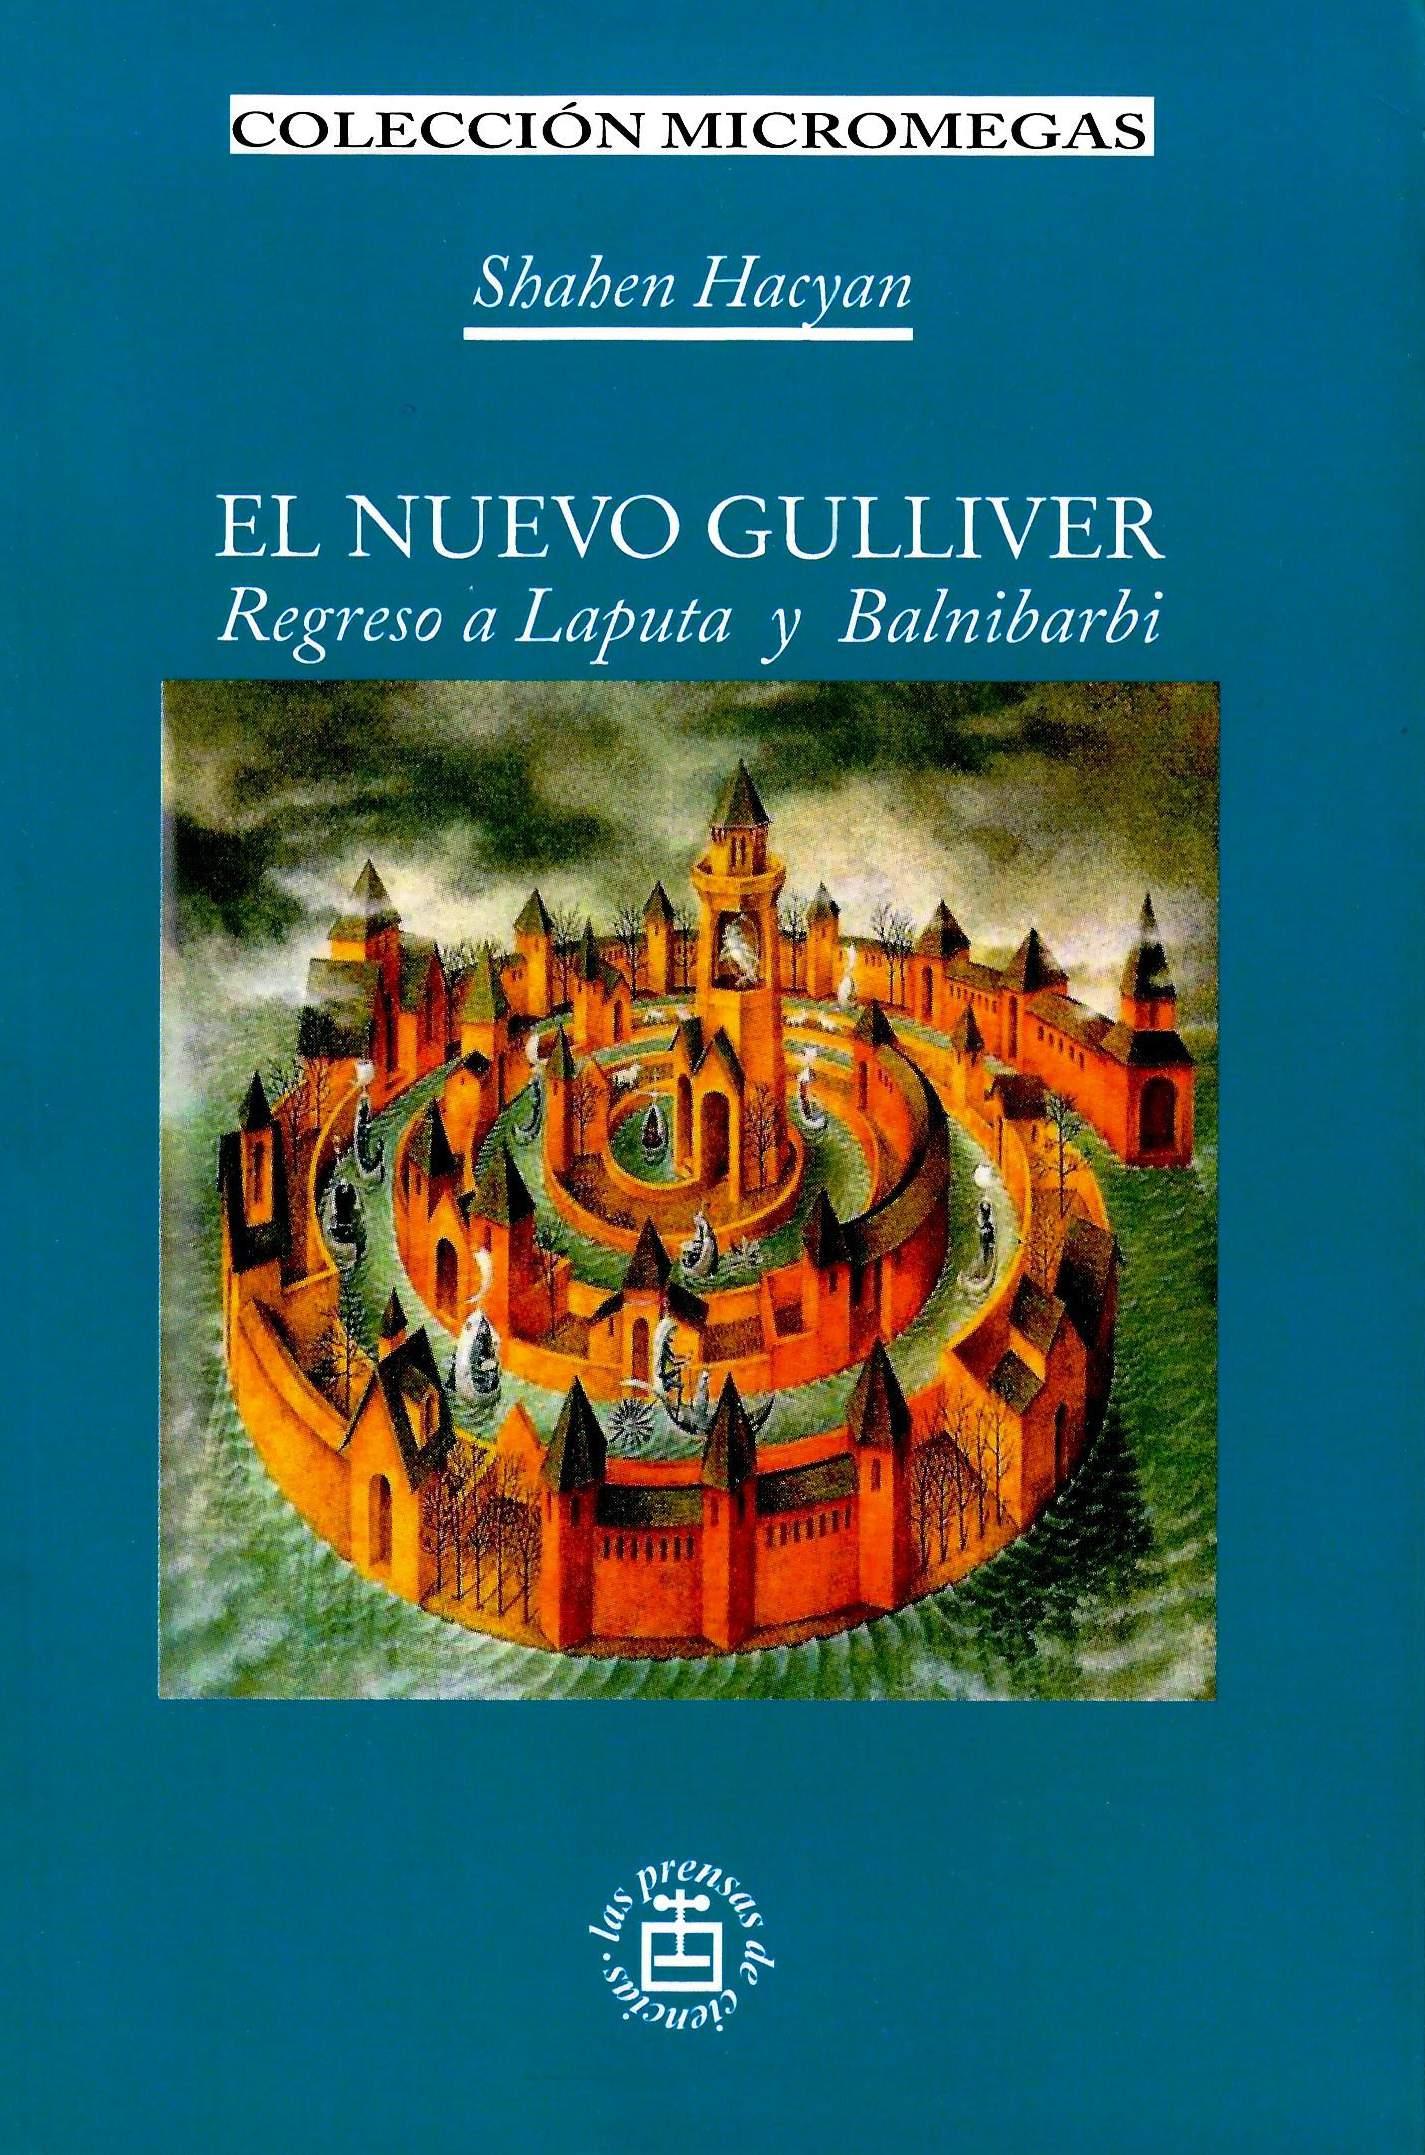 El nuevo Gulliver. Regreso a Laputa y Balnibarbi